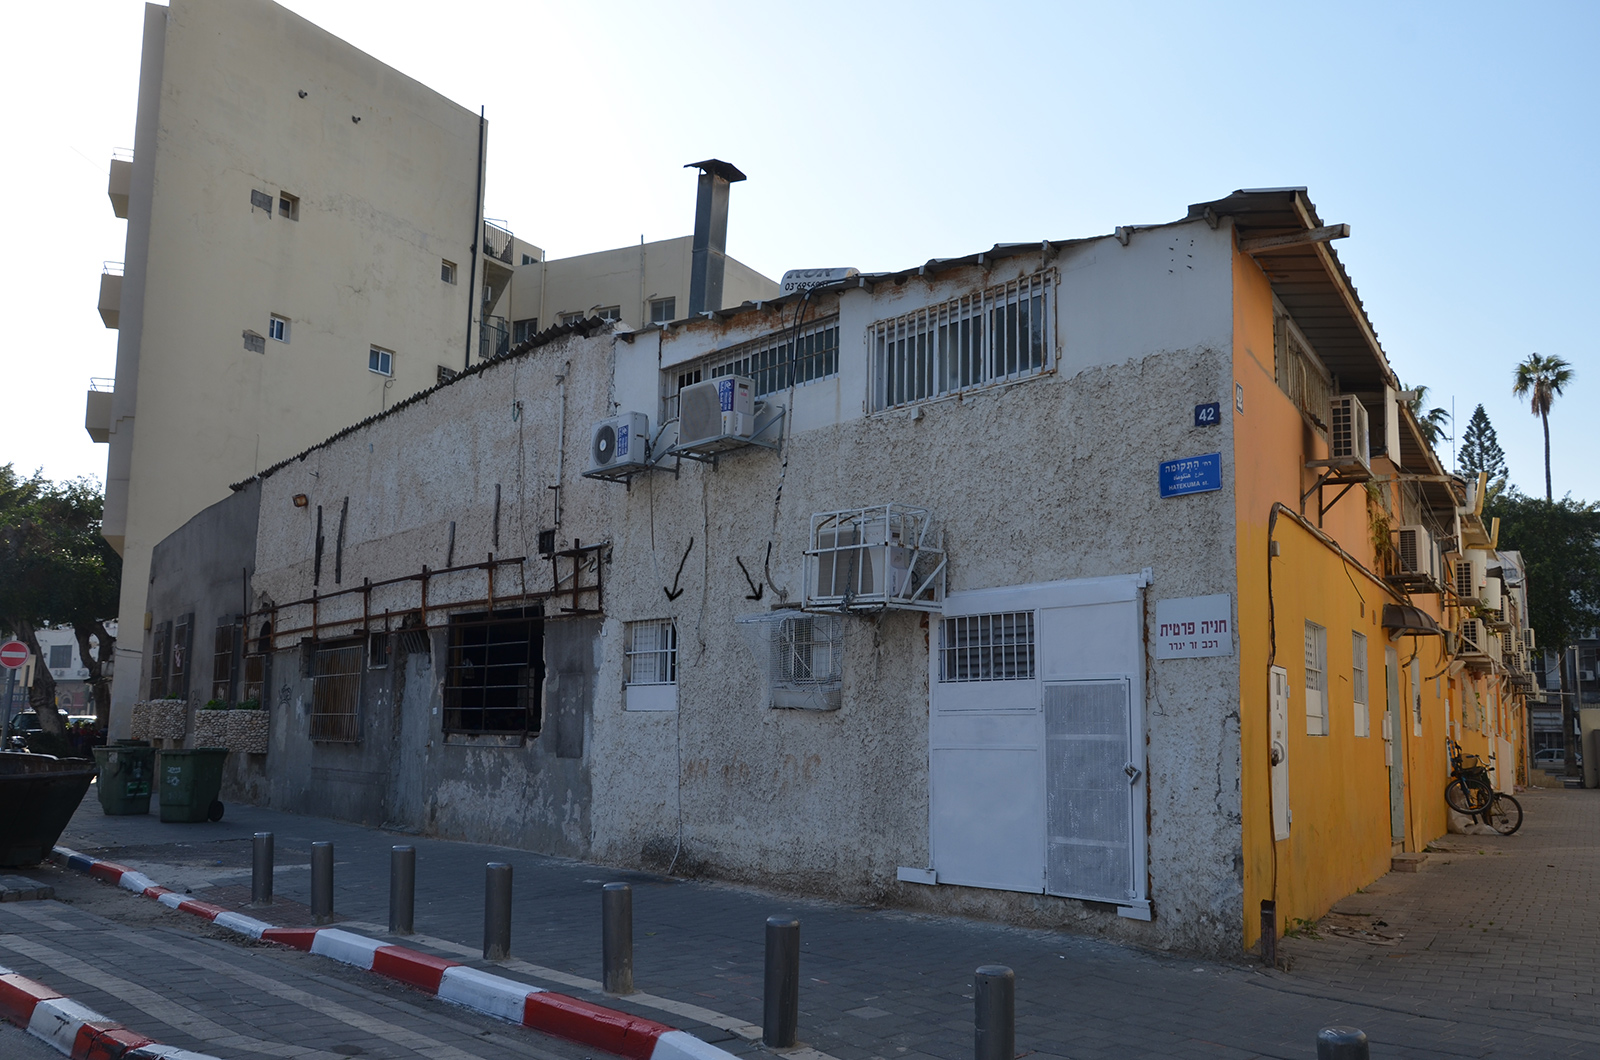 Moje nejlepší zaplivaná díra, Tel-Aviv Jaffo, Izrael